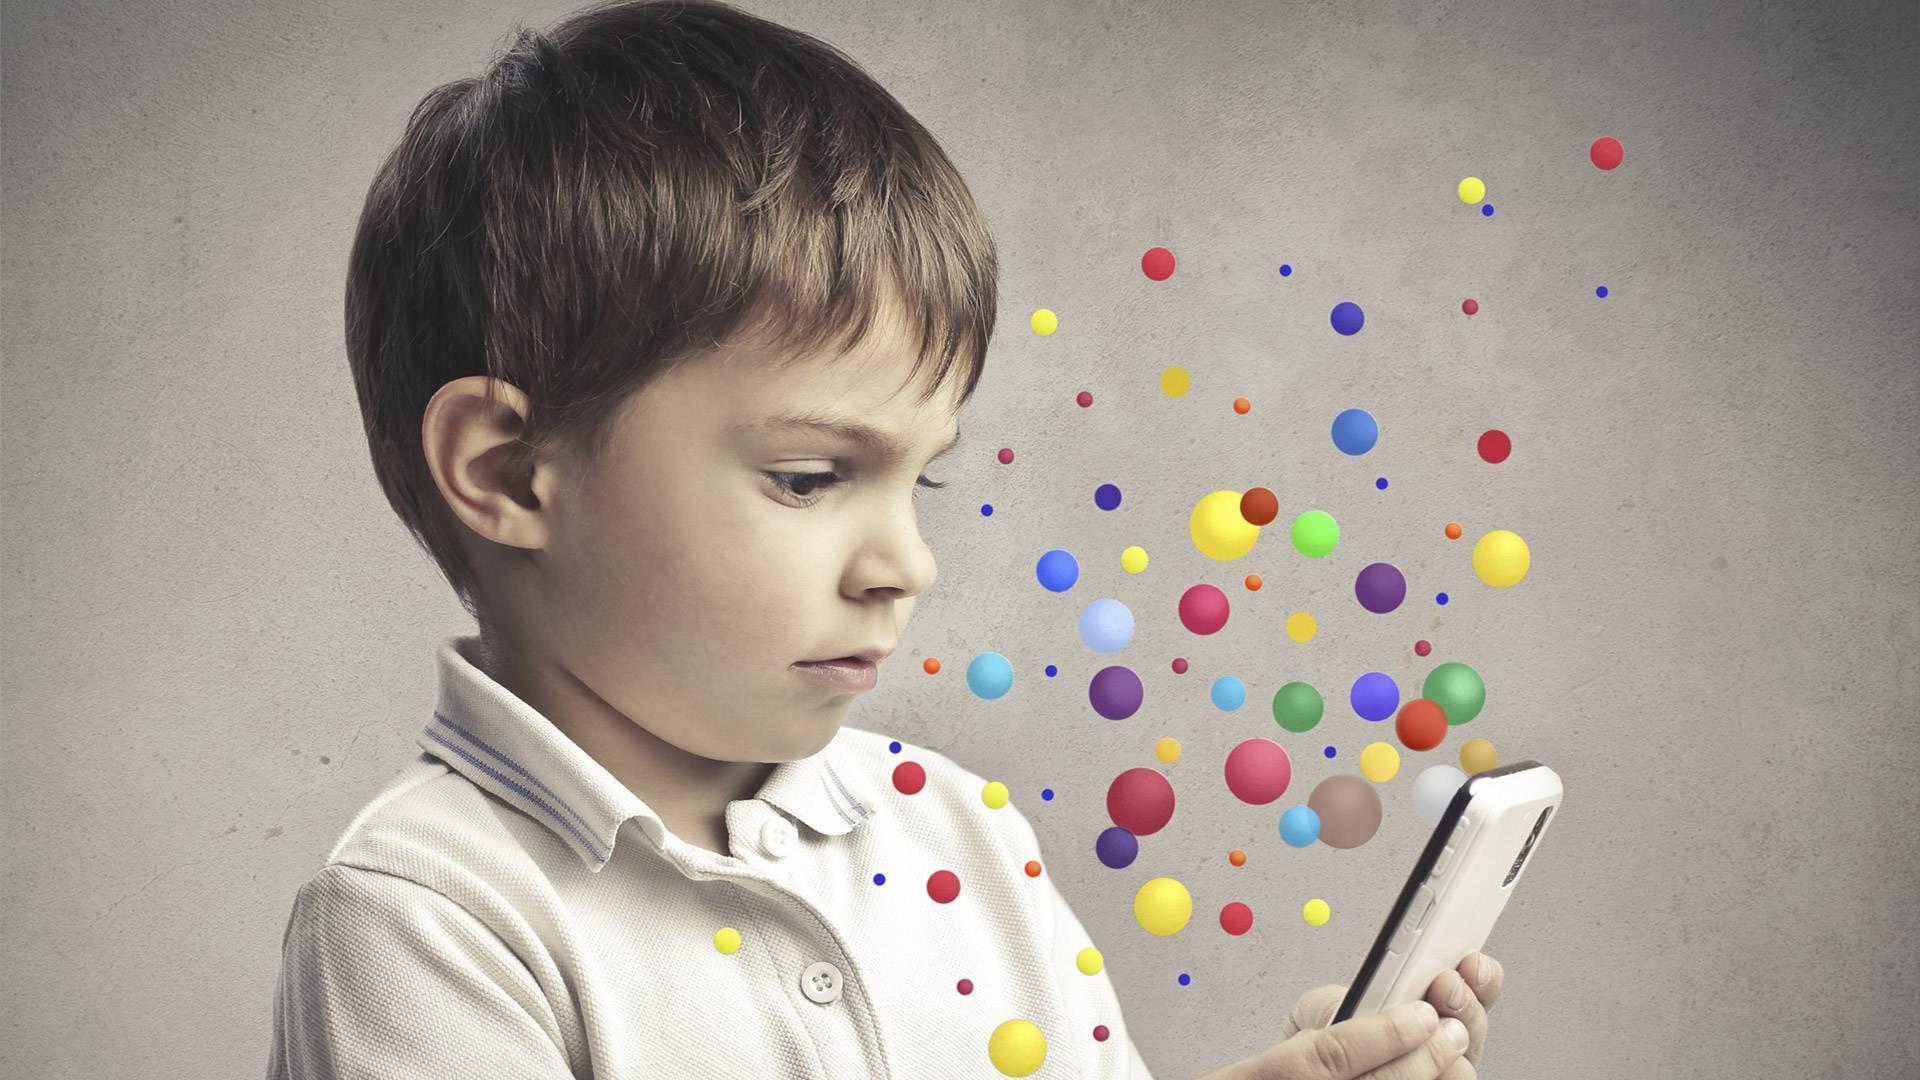 Смартфон в руках у ребенка